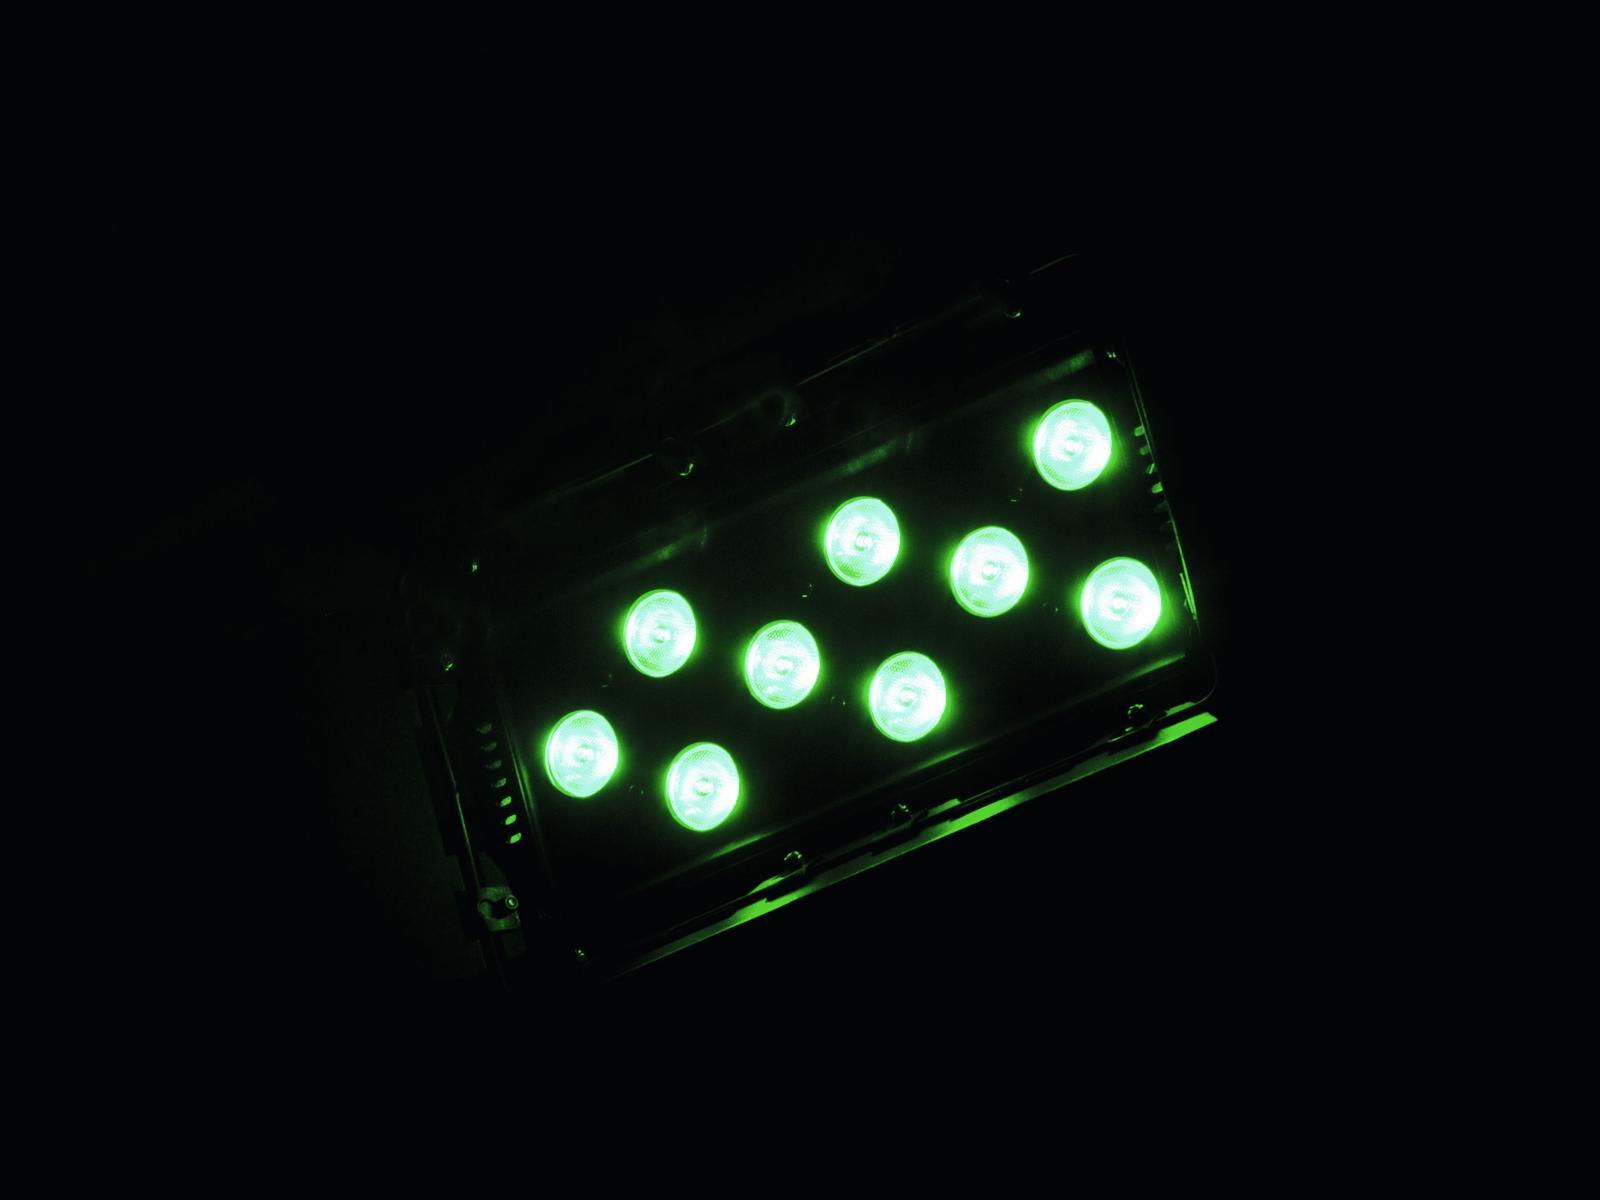 EUROLITE LED CLS-9 QLC RGBW 9x8W 12°